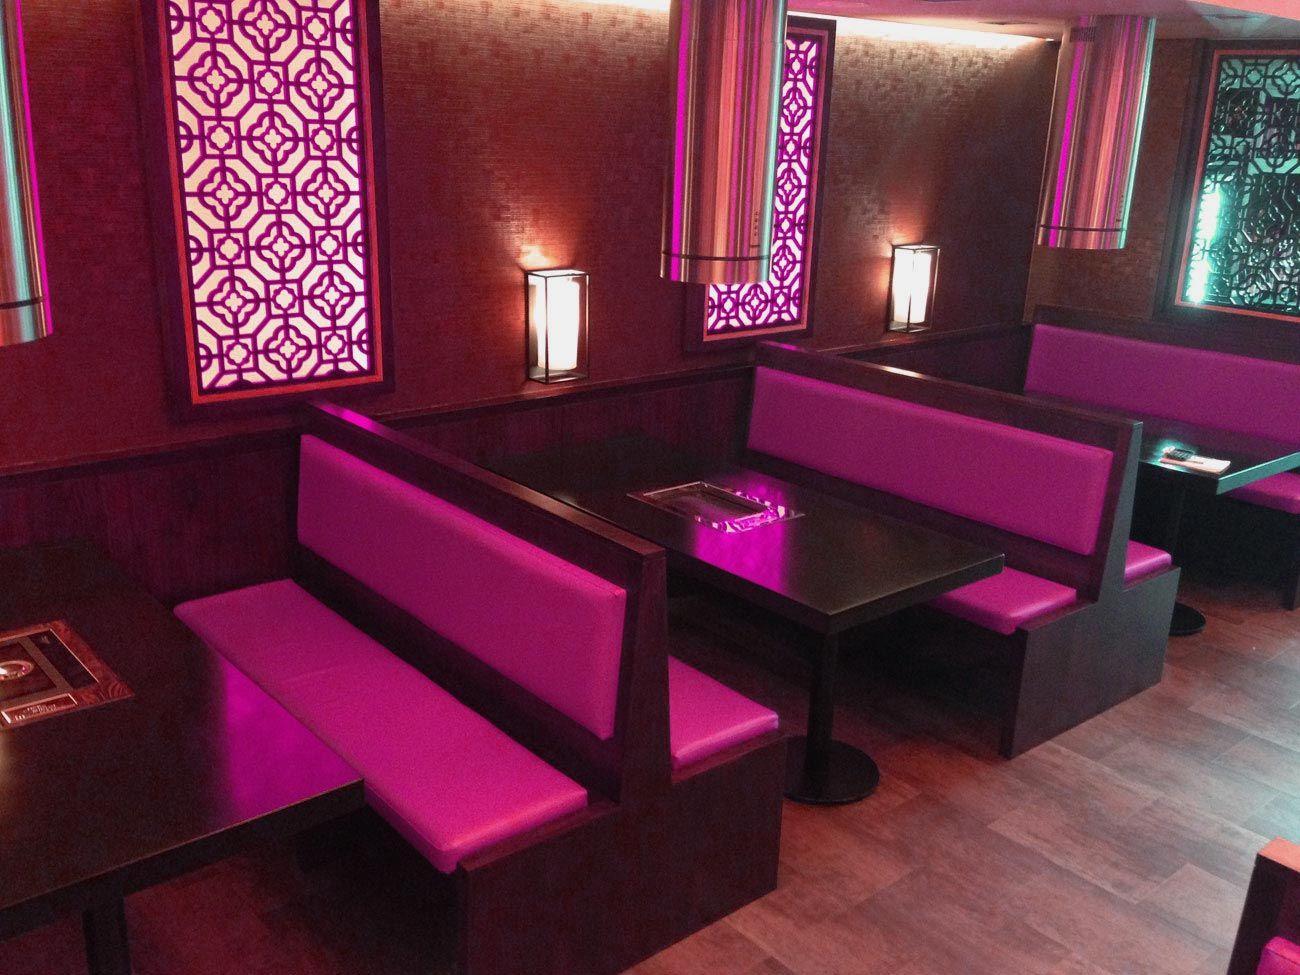 pink color restaurant interior designsmodern interior concepts